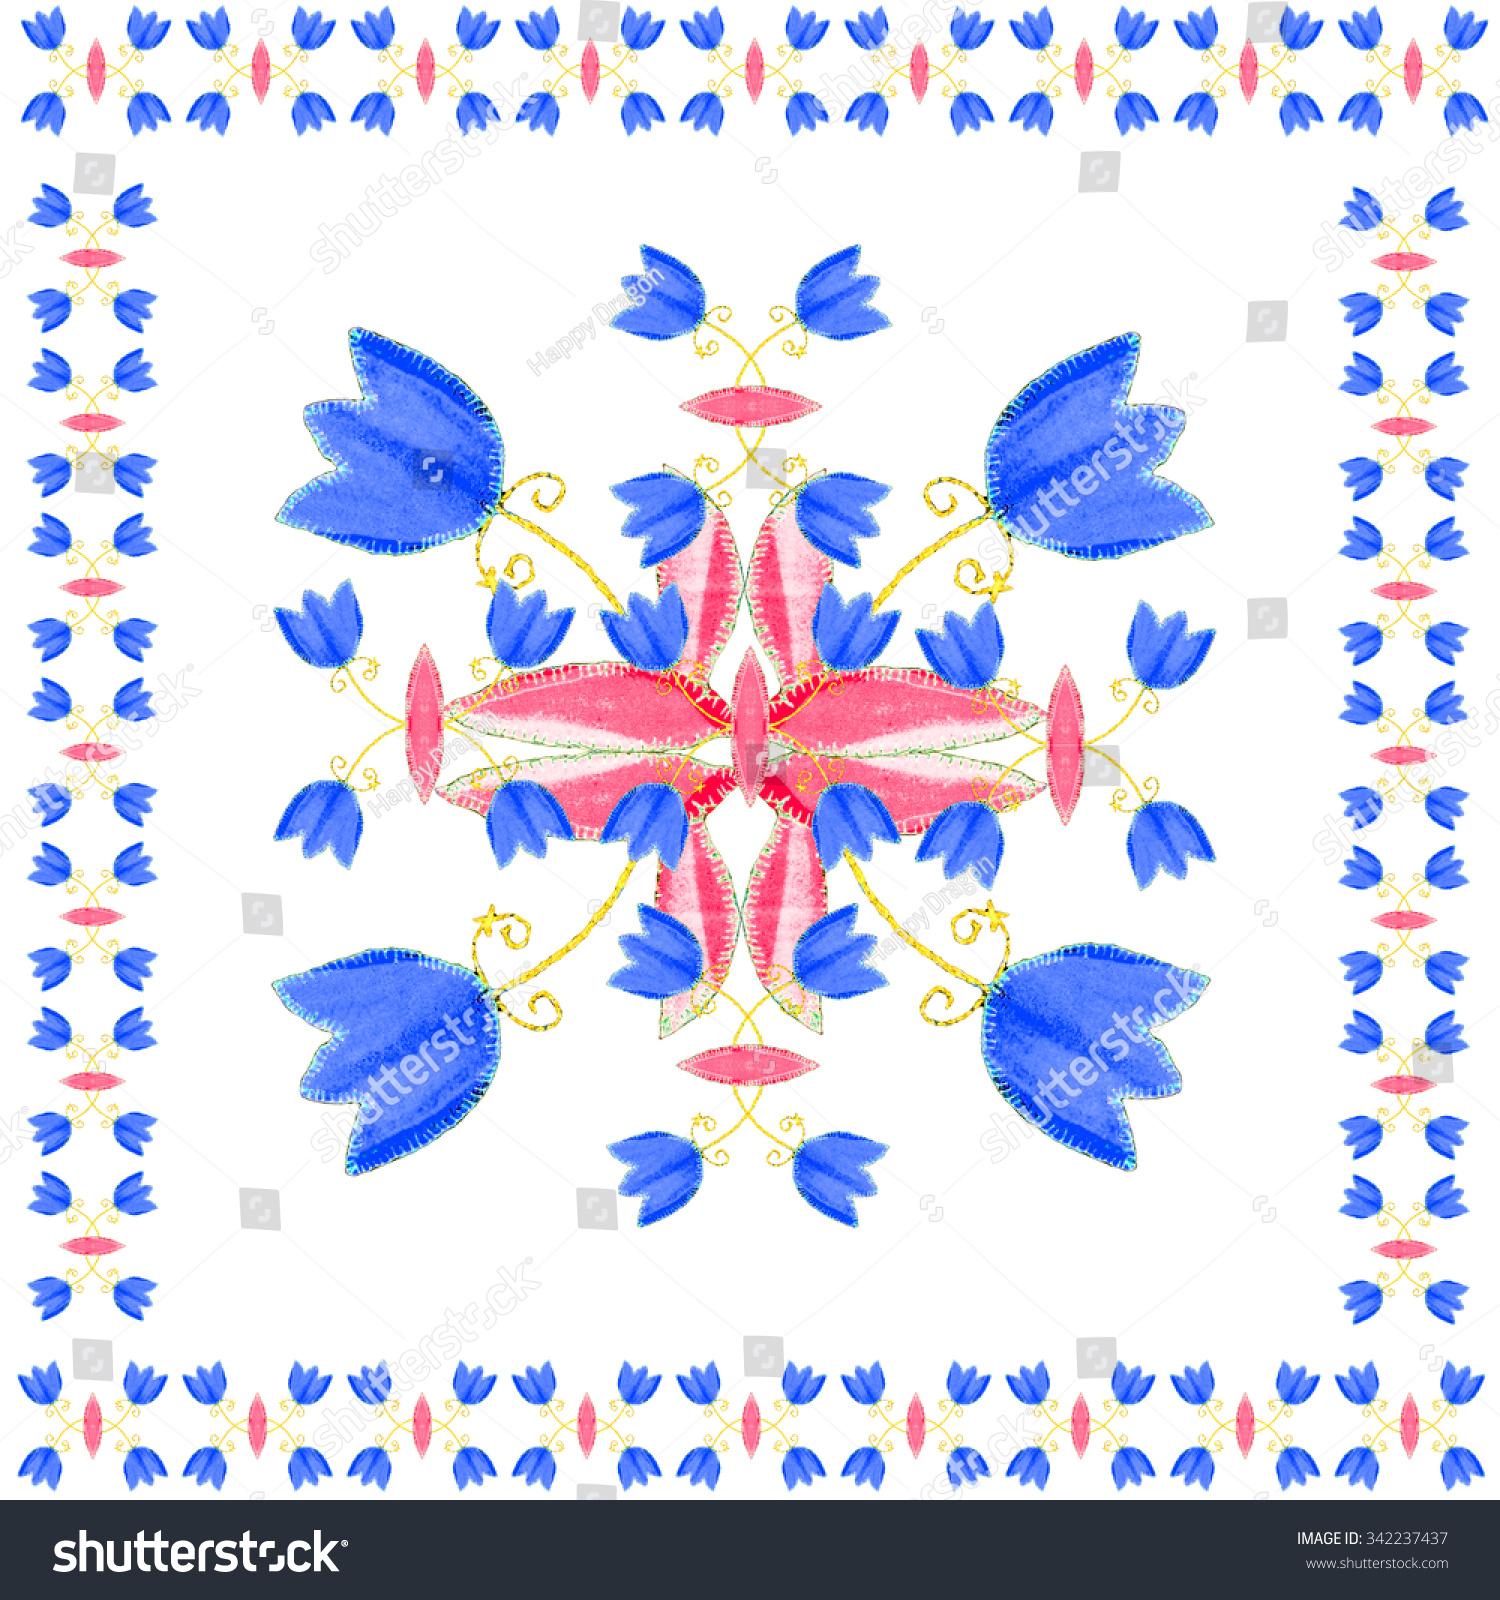 Collection Decorative Shawls Pictures - Newyorkfashion